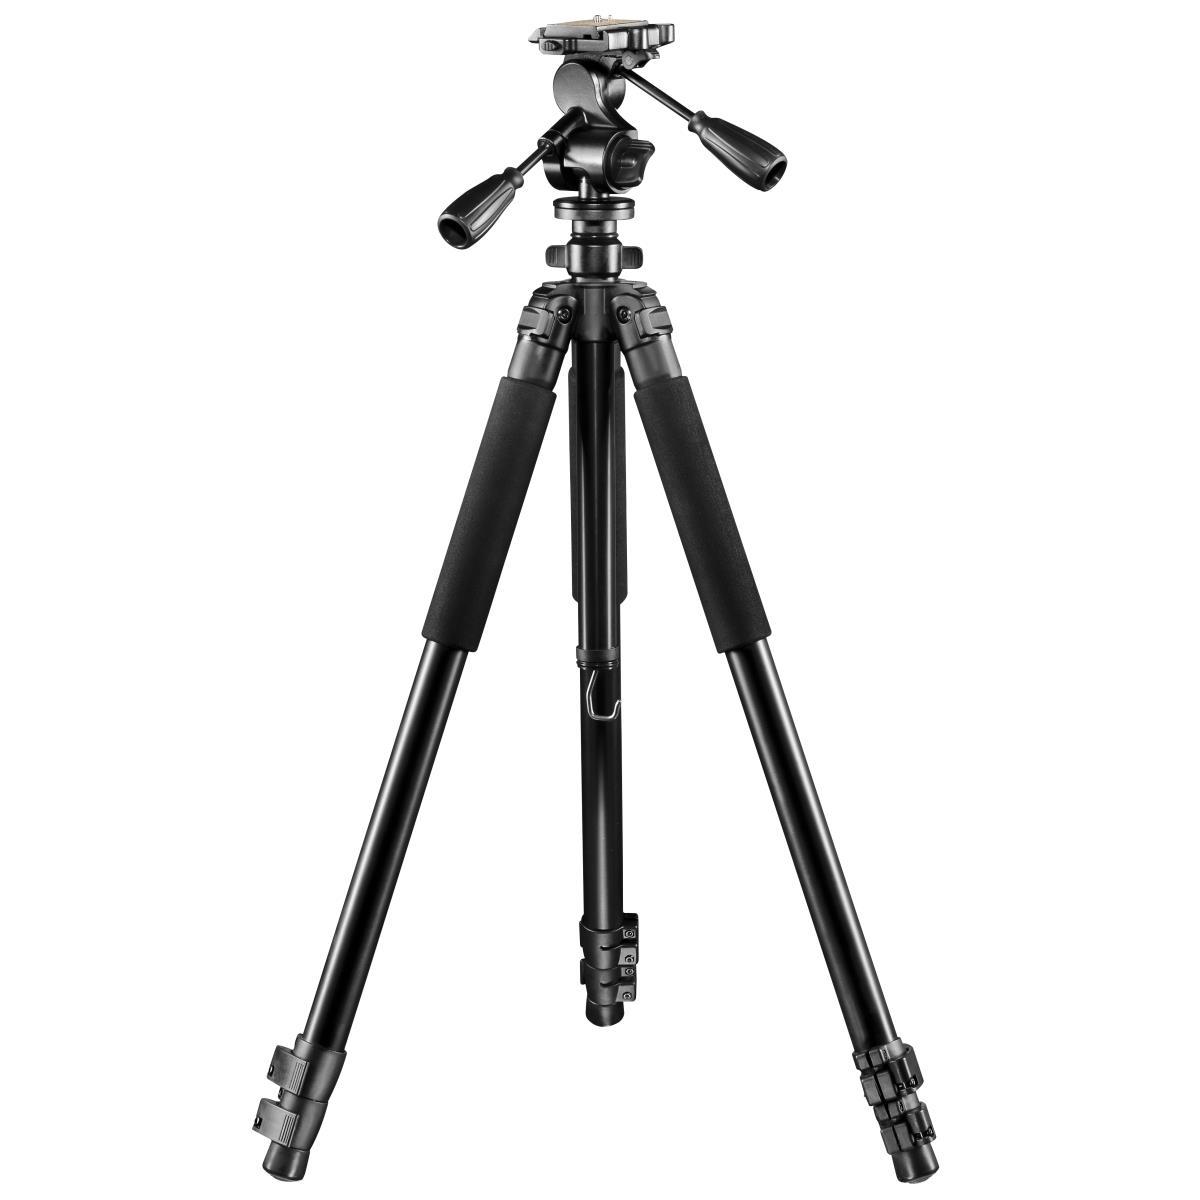 Walimex pro FT-665T Pro Stativ mit FT-6653H Aluminium Pro-3D-Neiger, 198cm